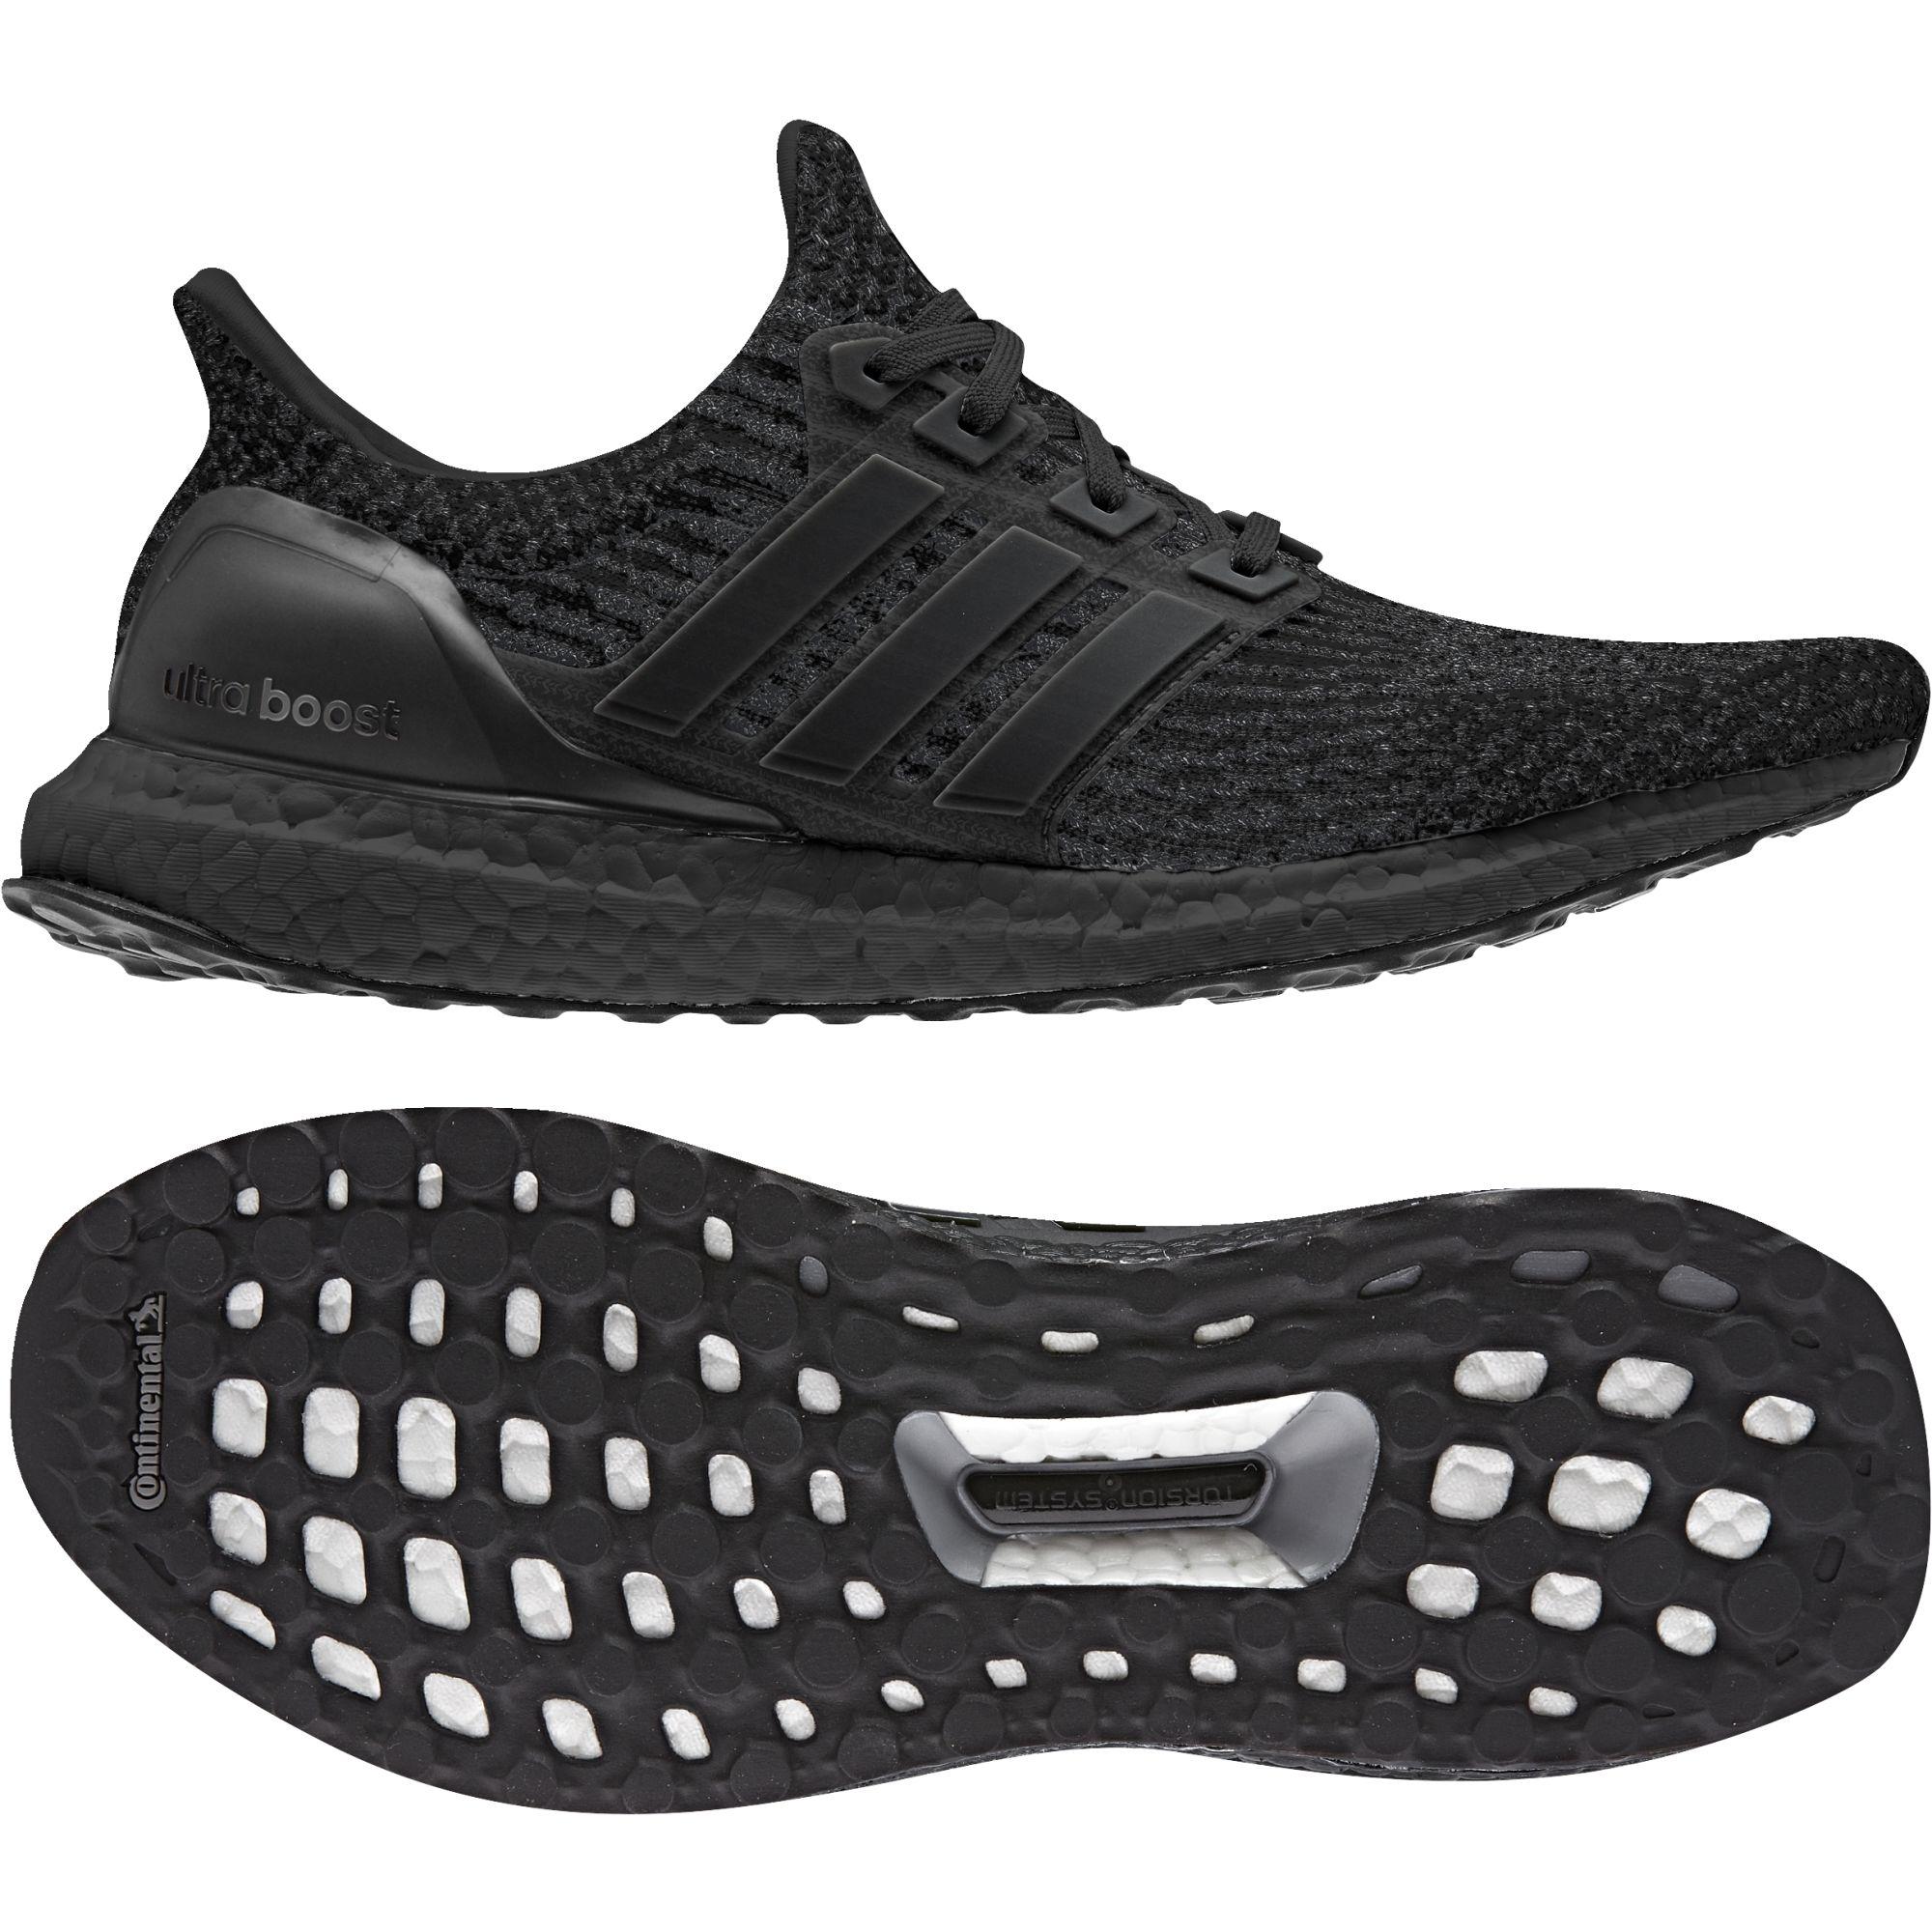 Adidas Ultra Boost 3.0 Triple Black in Schwarz